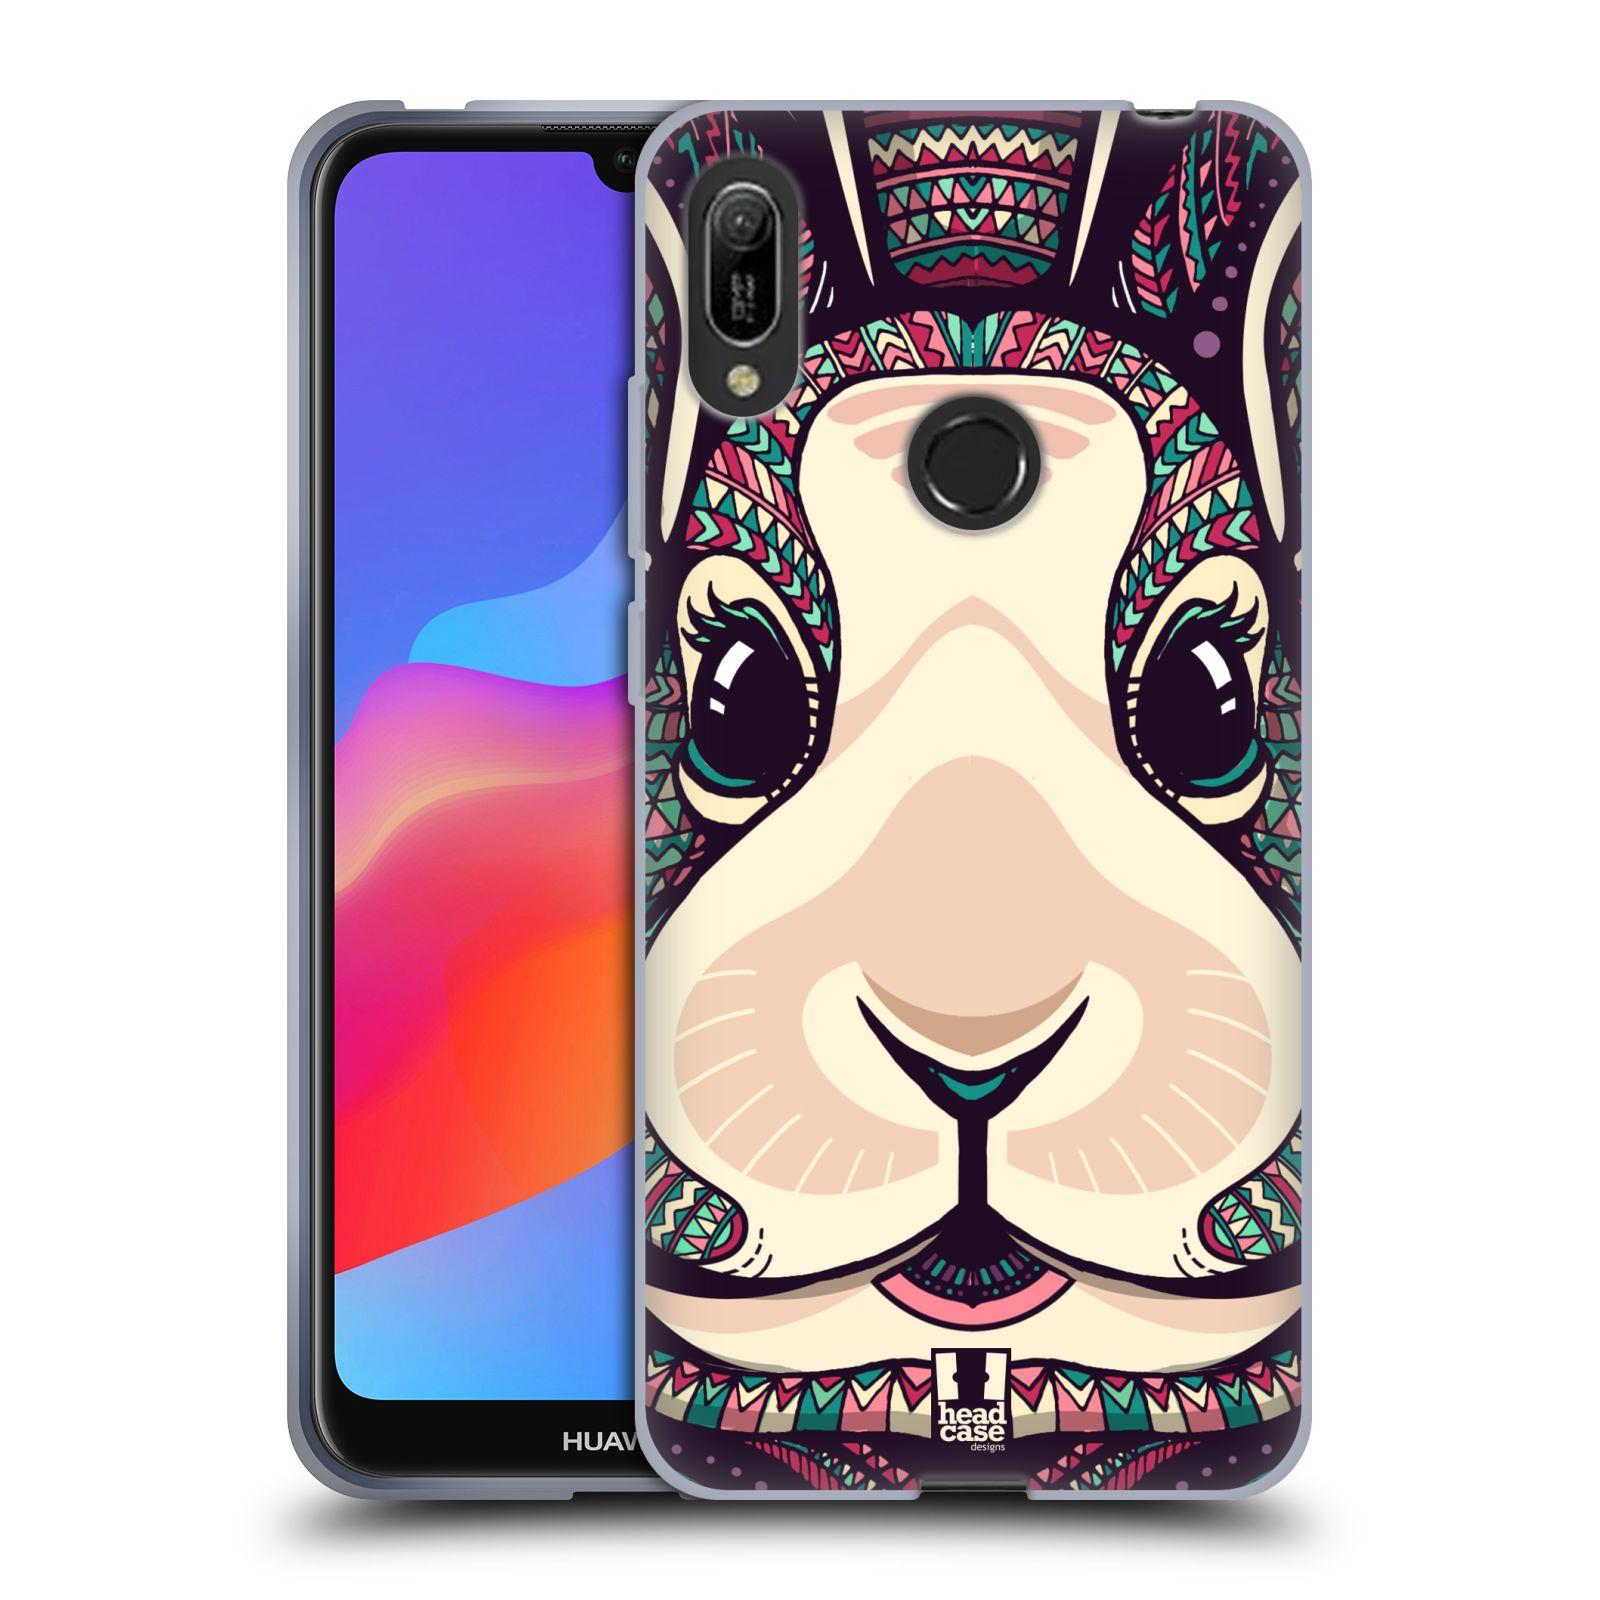 Silikonové pouzdro na mobil Huawei Y6 (2019) - Head Case - AZTEC ZAJÍČEK